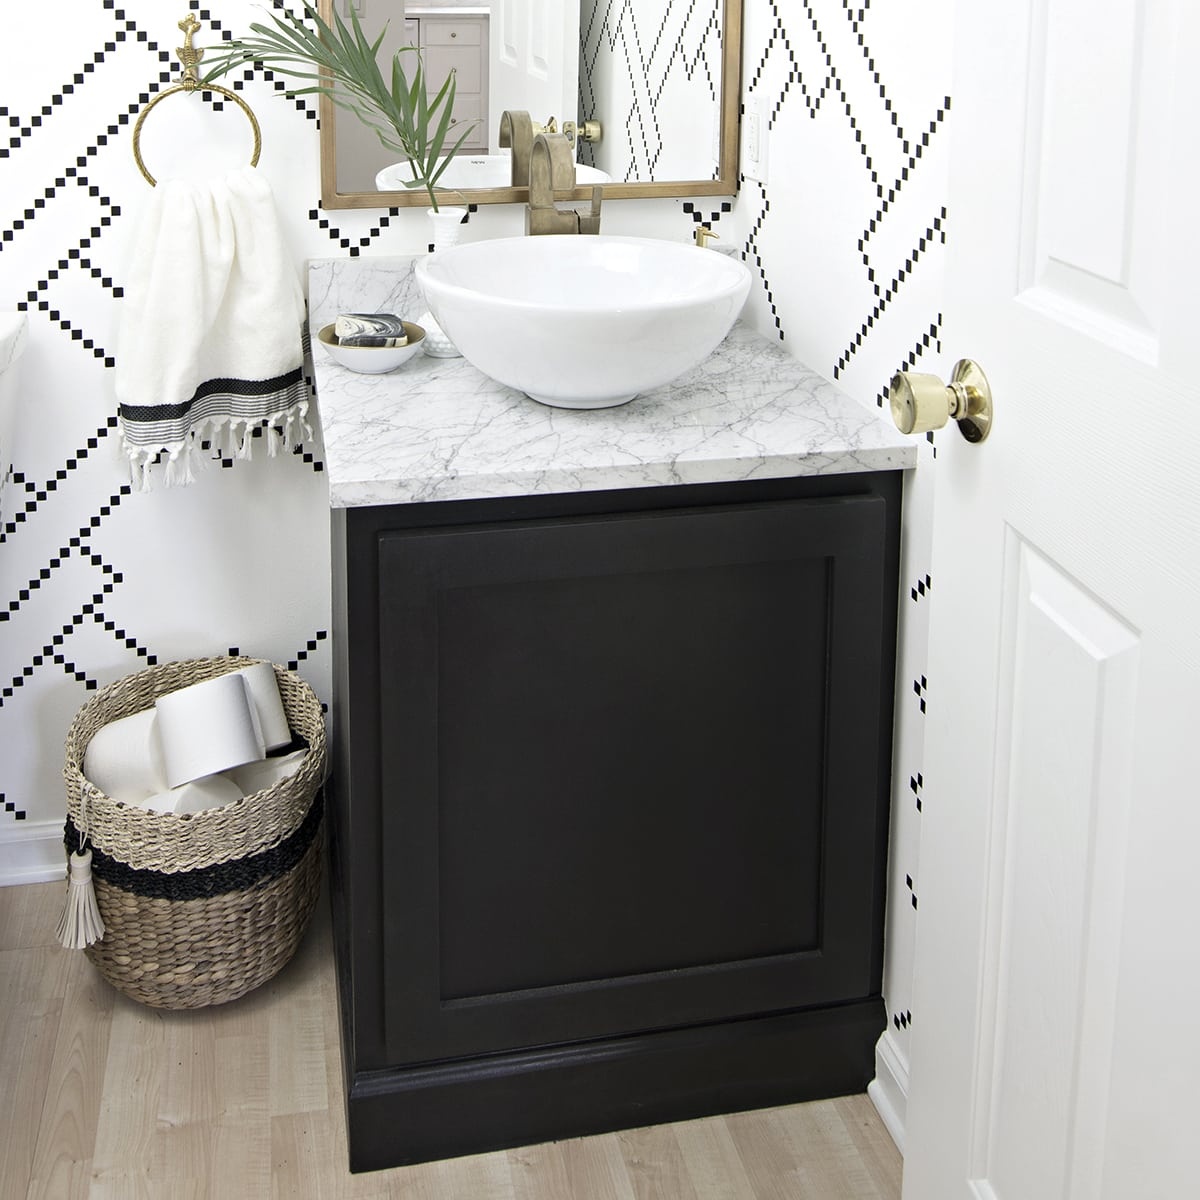 Bathroom Cabinet Kick Plate Makeover Cuckoo4design